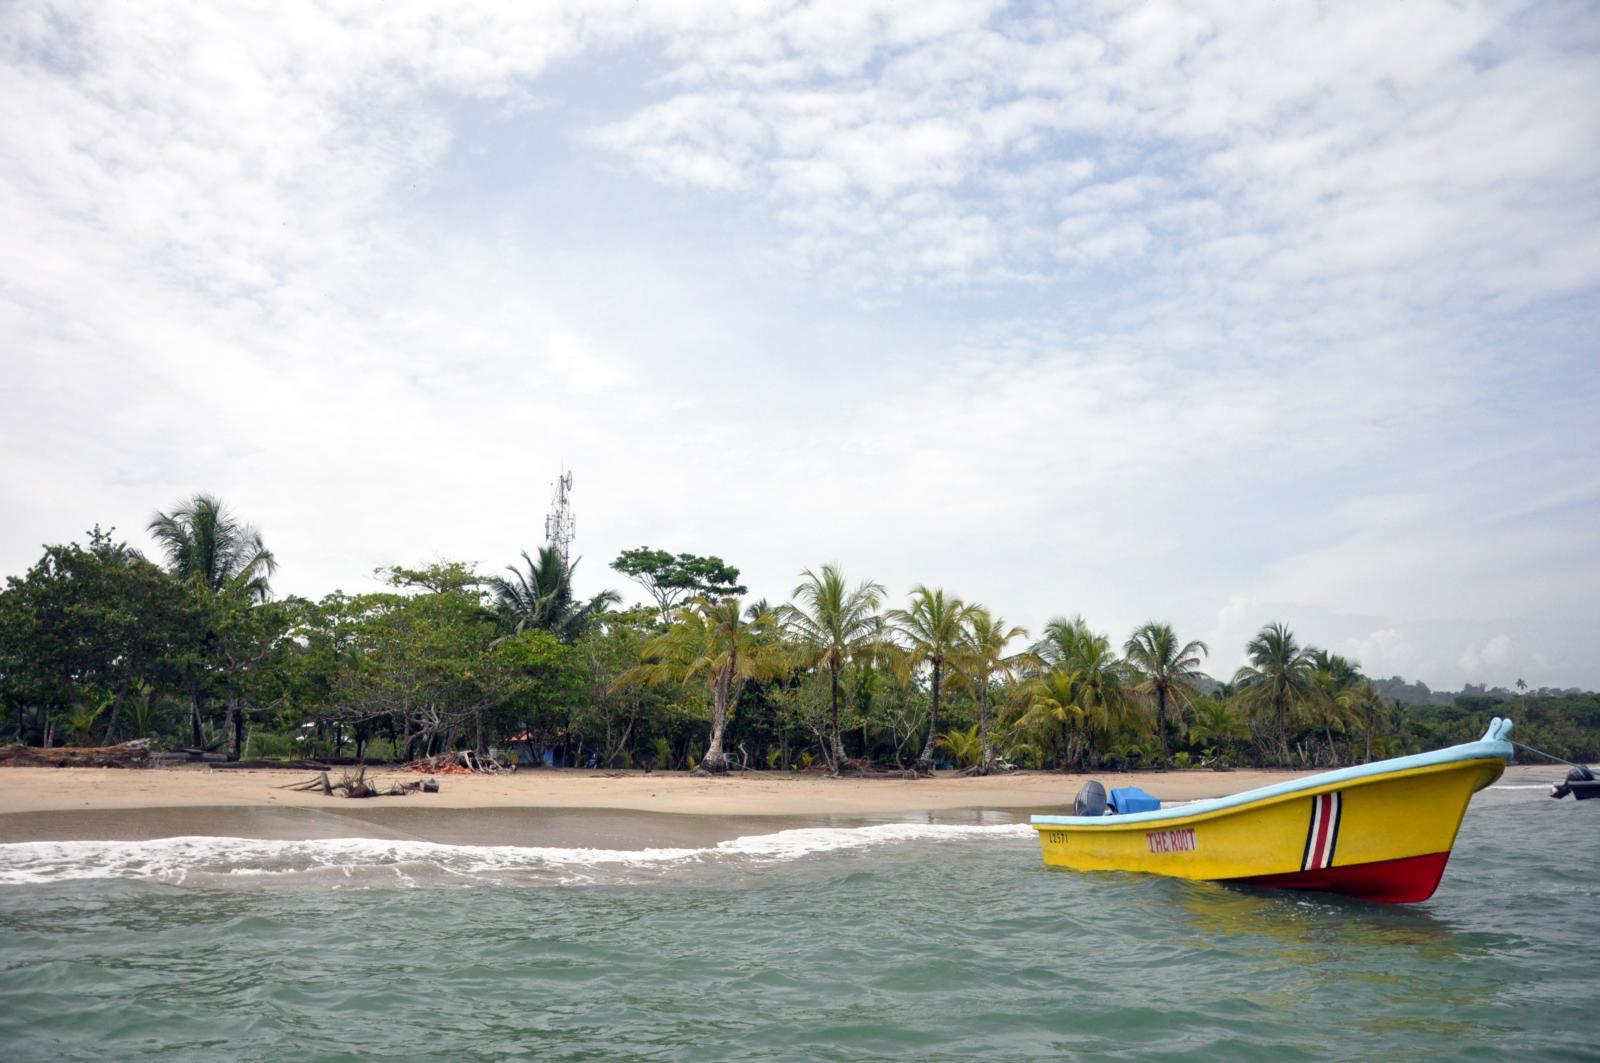 plage et bateau au Costa Rica